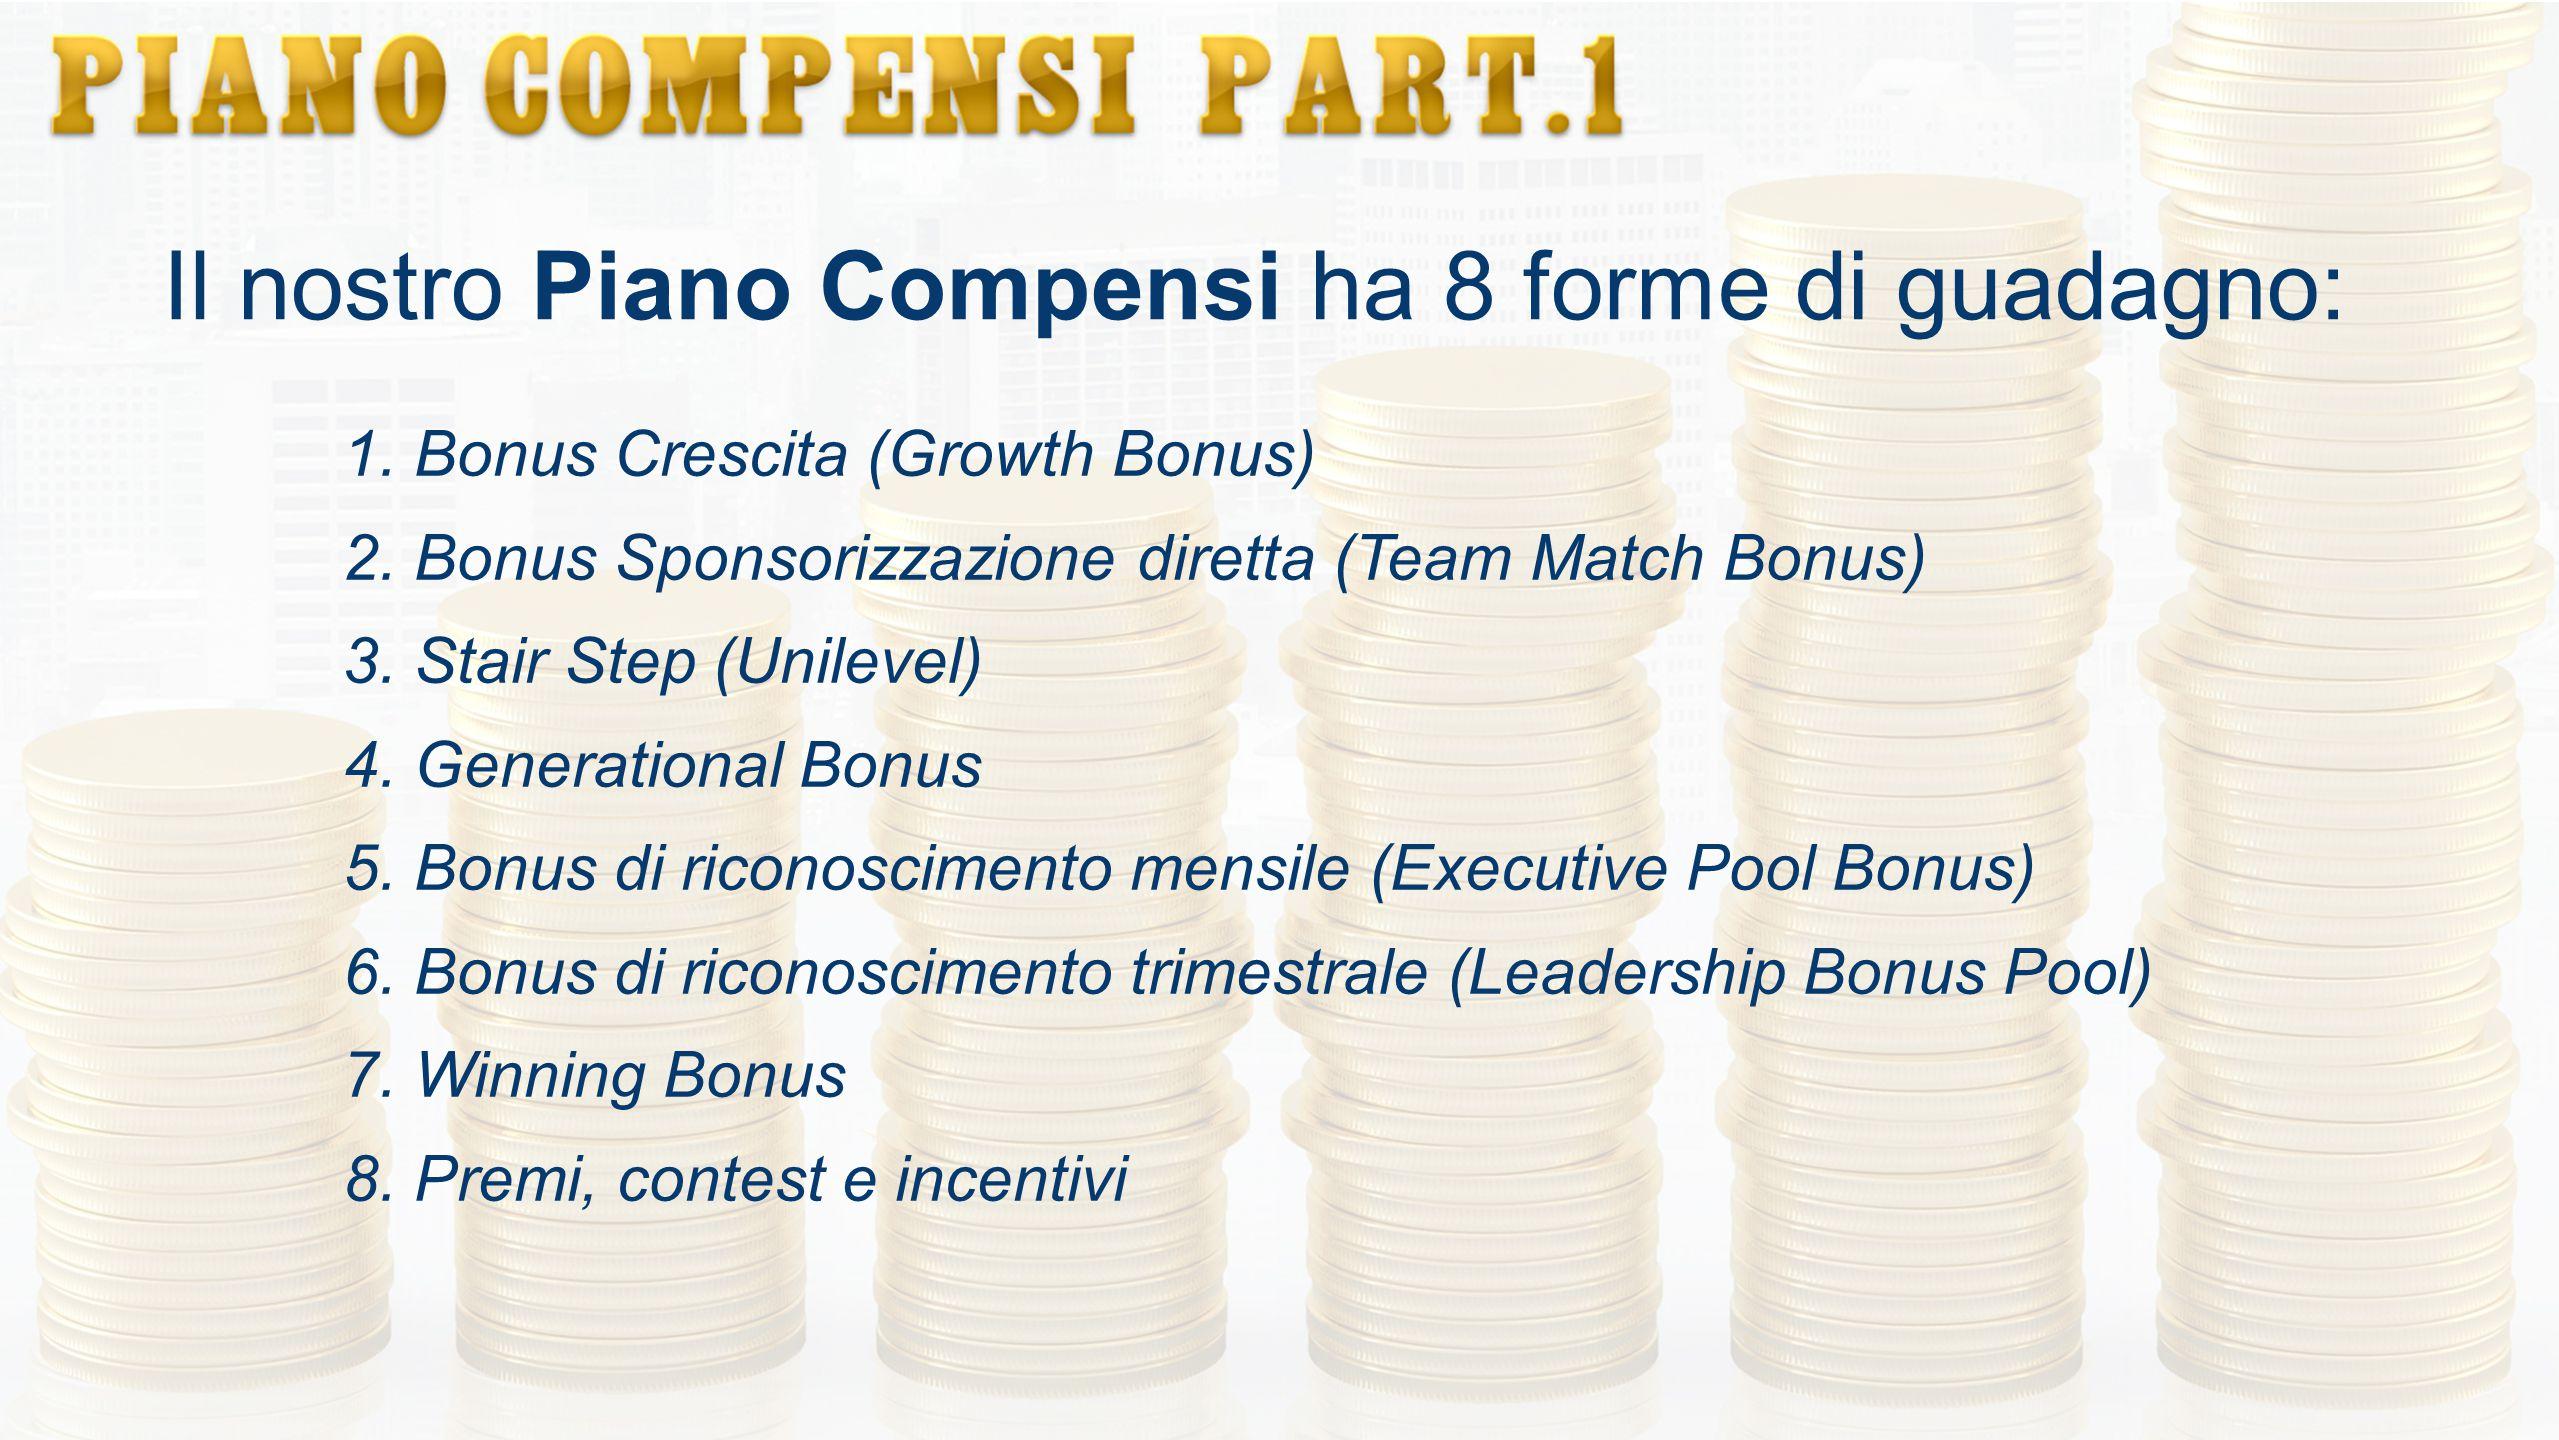 Il nostro Piano Compensi ha 8 forme di guadagno: 1. Bonus Crescita (Growth Bonus) 2. Bonus Sponsorizzazione diretta (Team Match Bonus) 3. Stair Step (